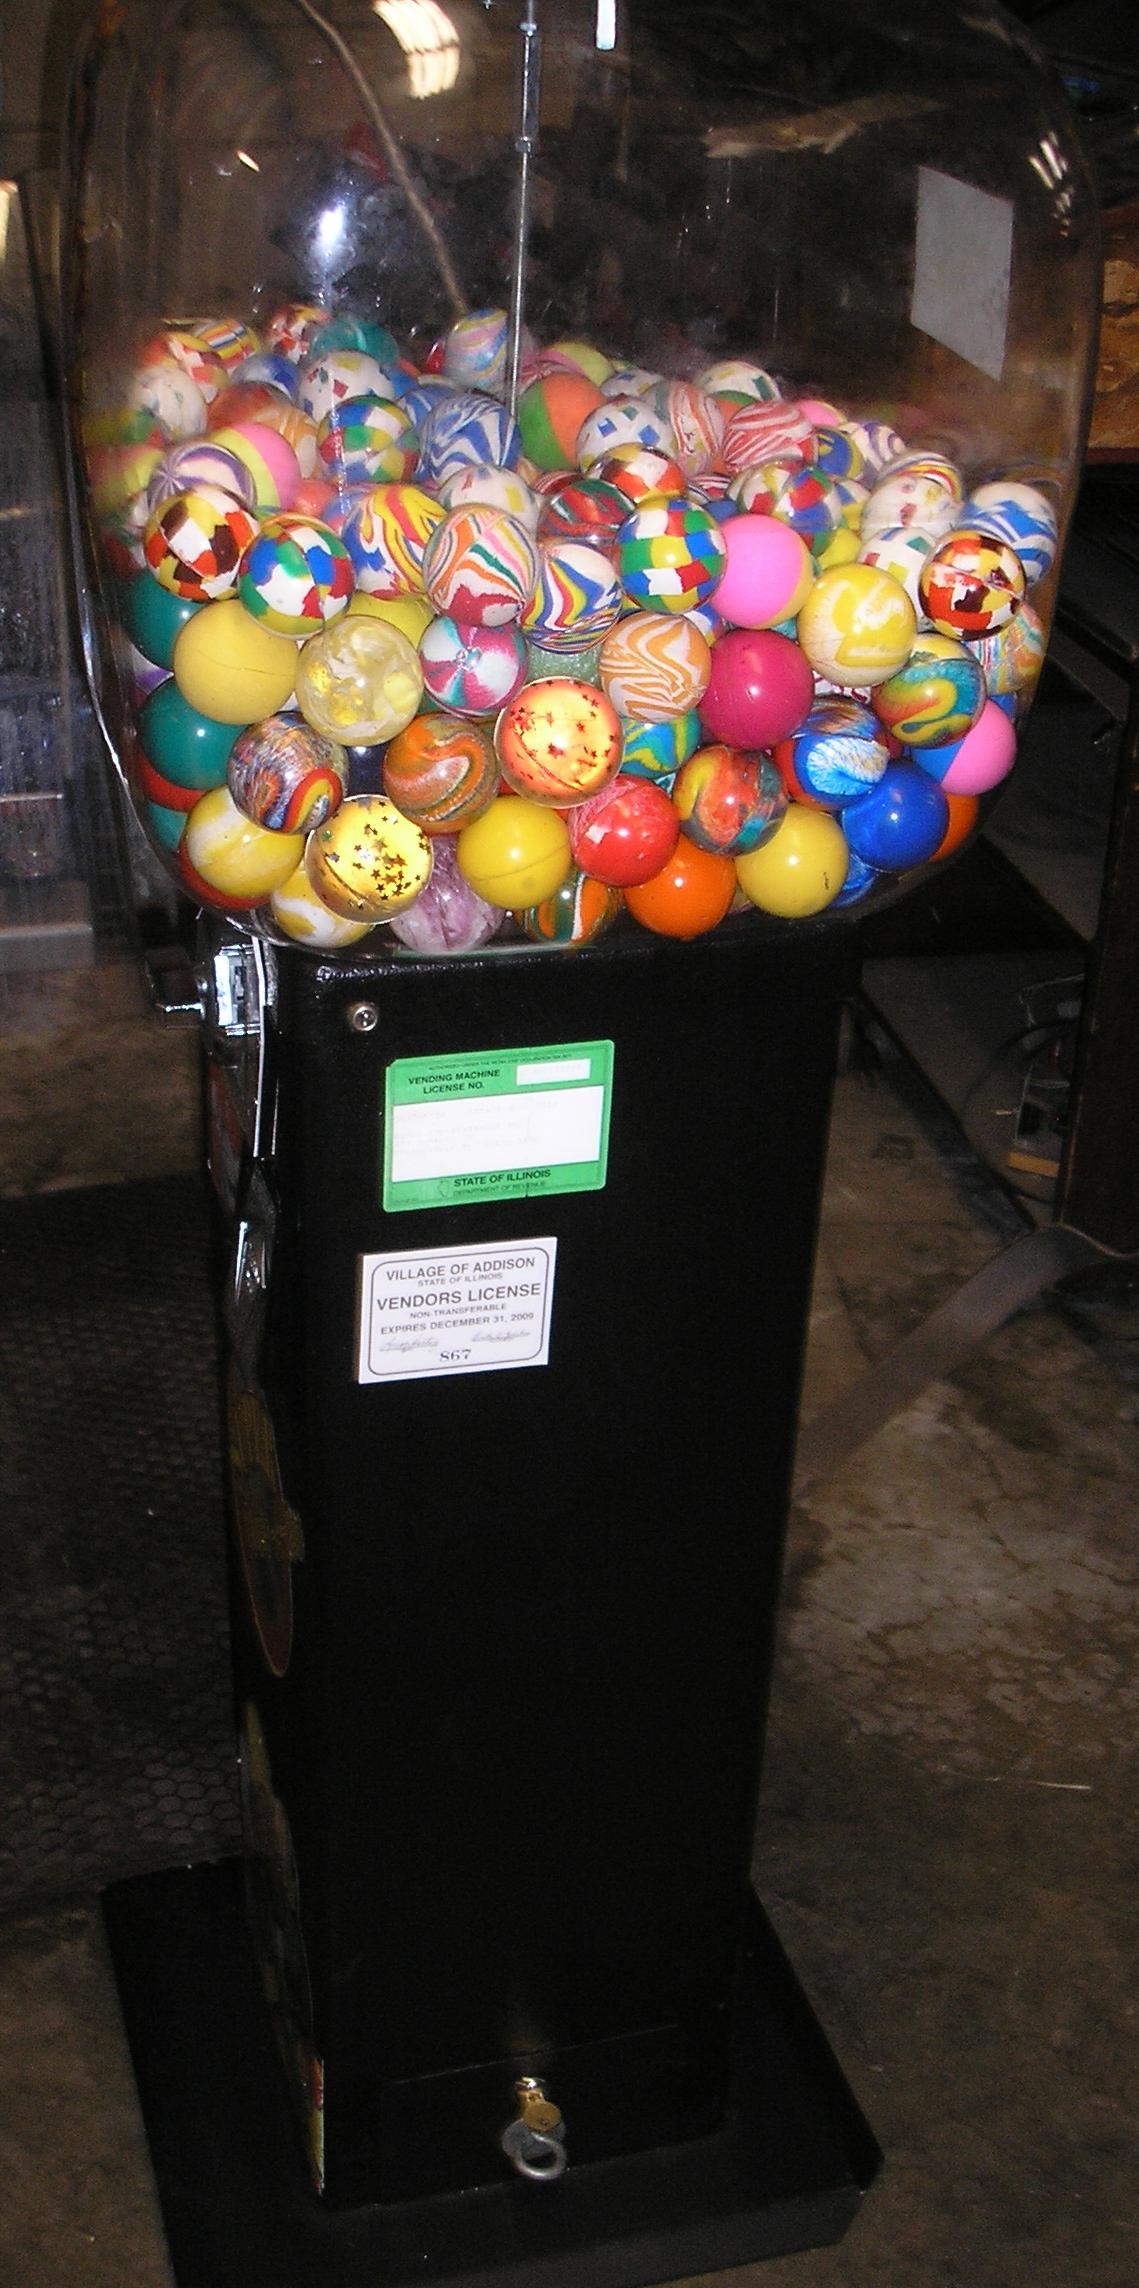 Super Bounce A Roo Merchandiser Arcade Machine Game For